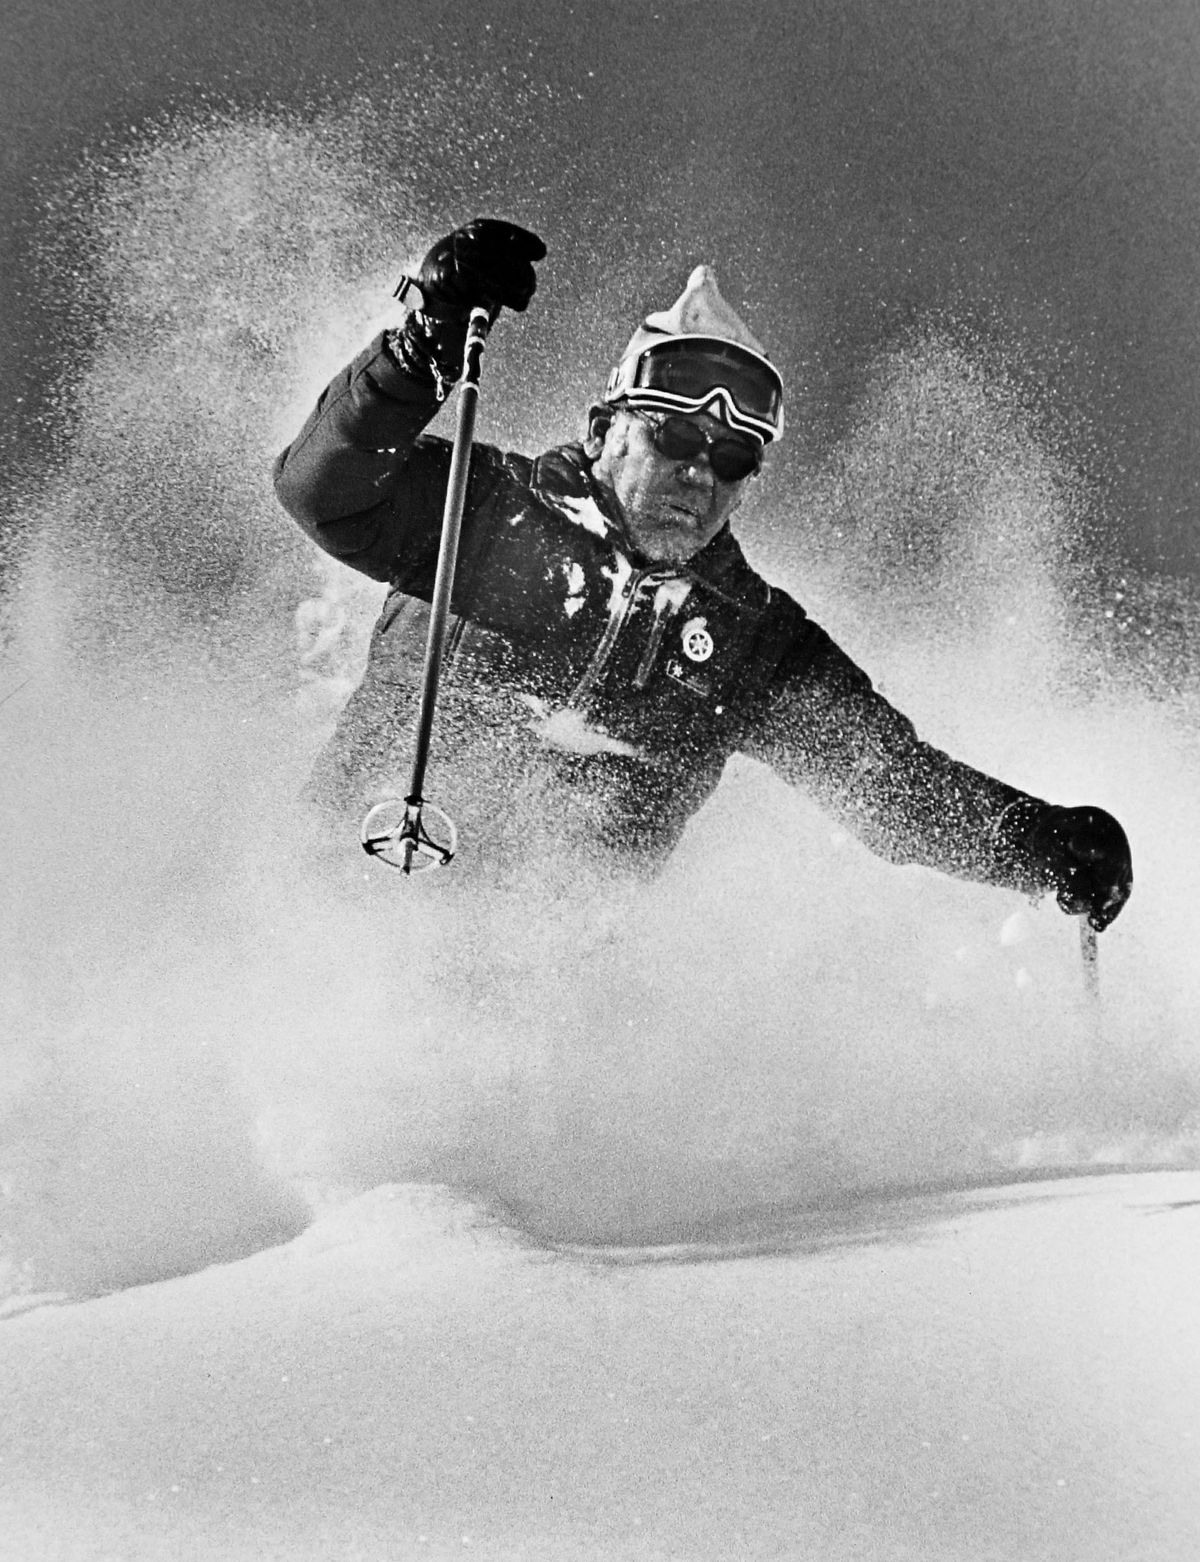 Skiing with Alf Engen.